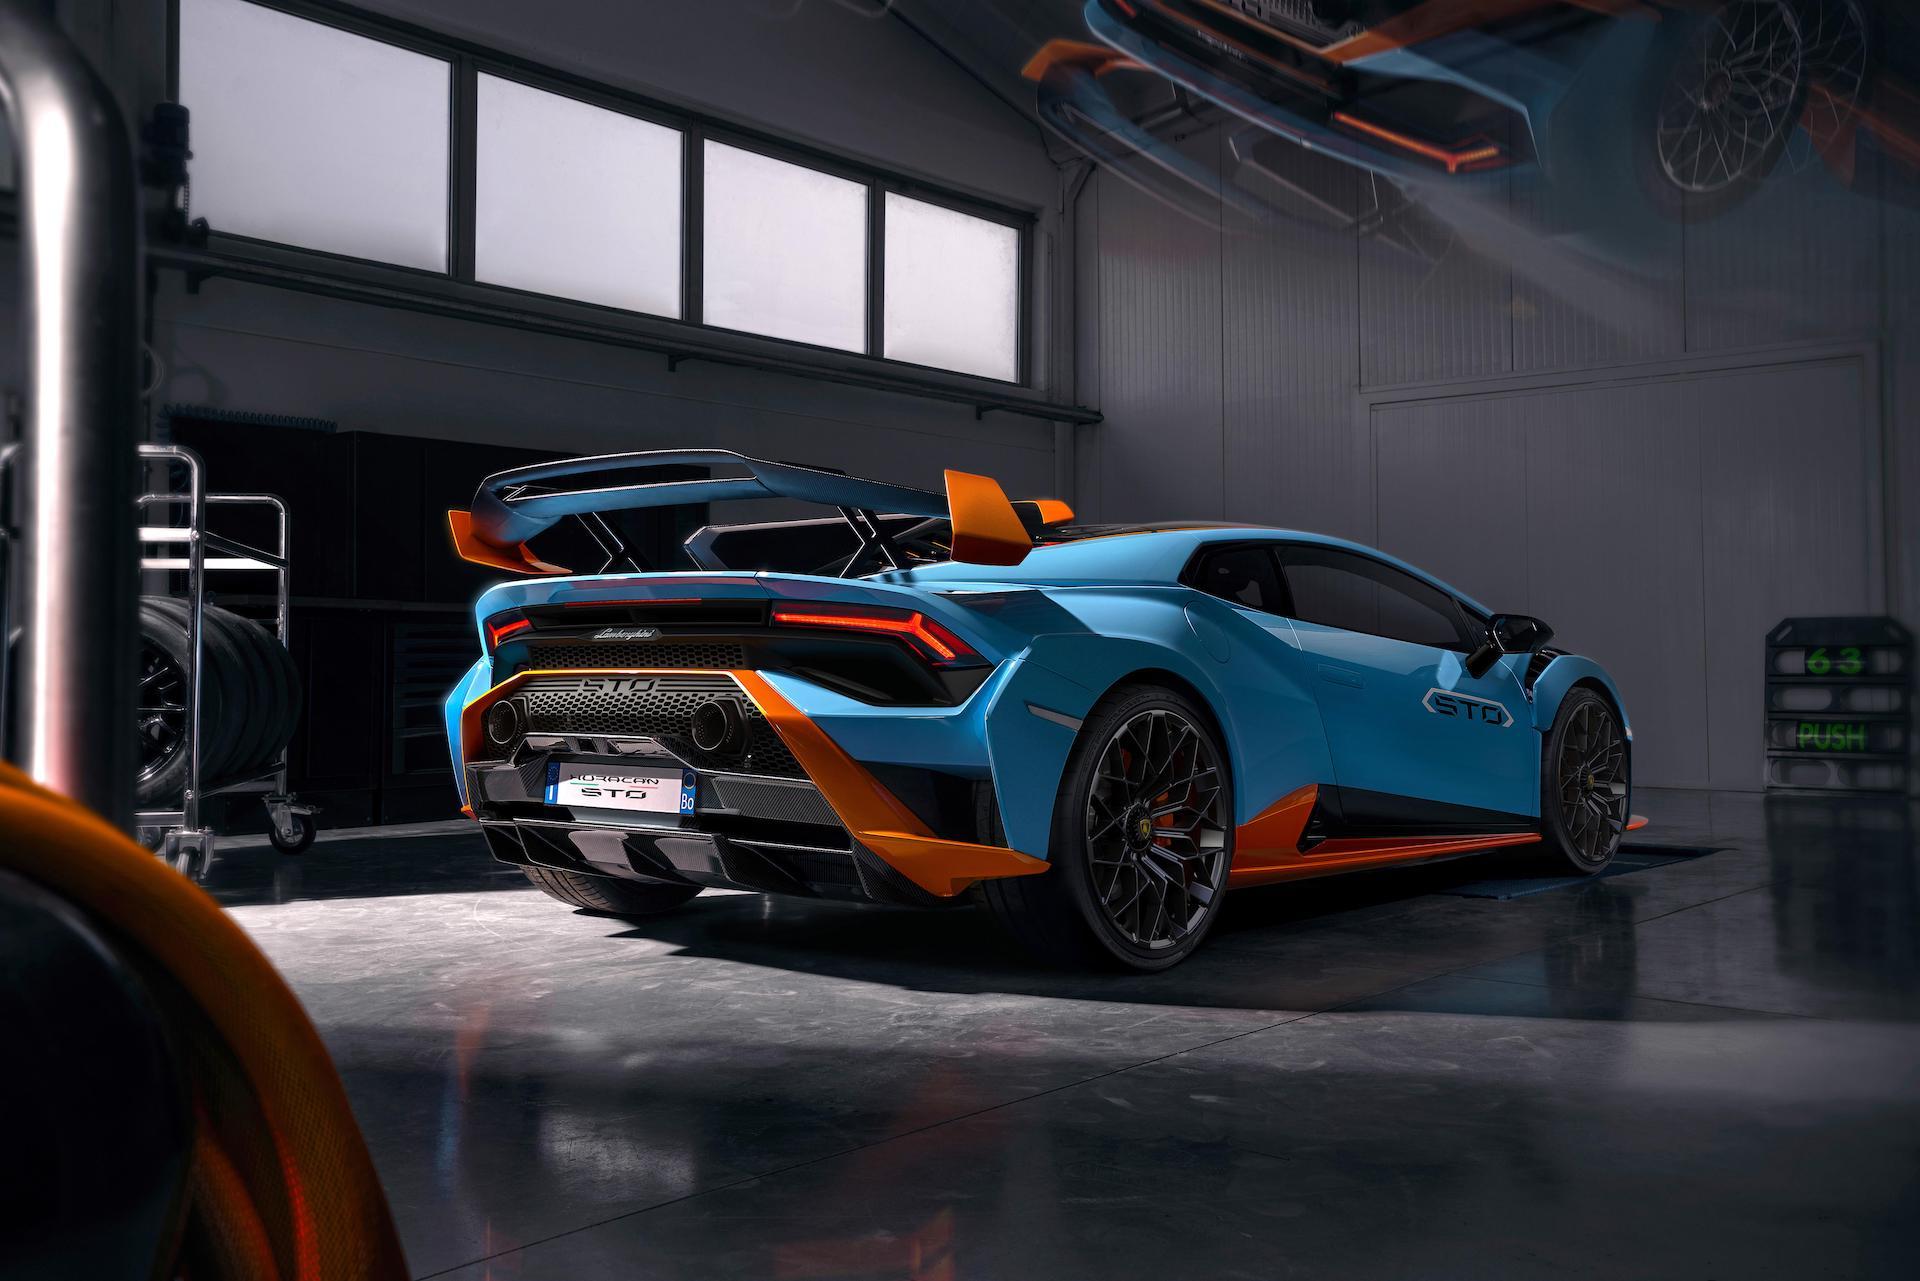 Der neue Lamborghini STO: Die Inkarnation des Squadra Corse-Erbes 13